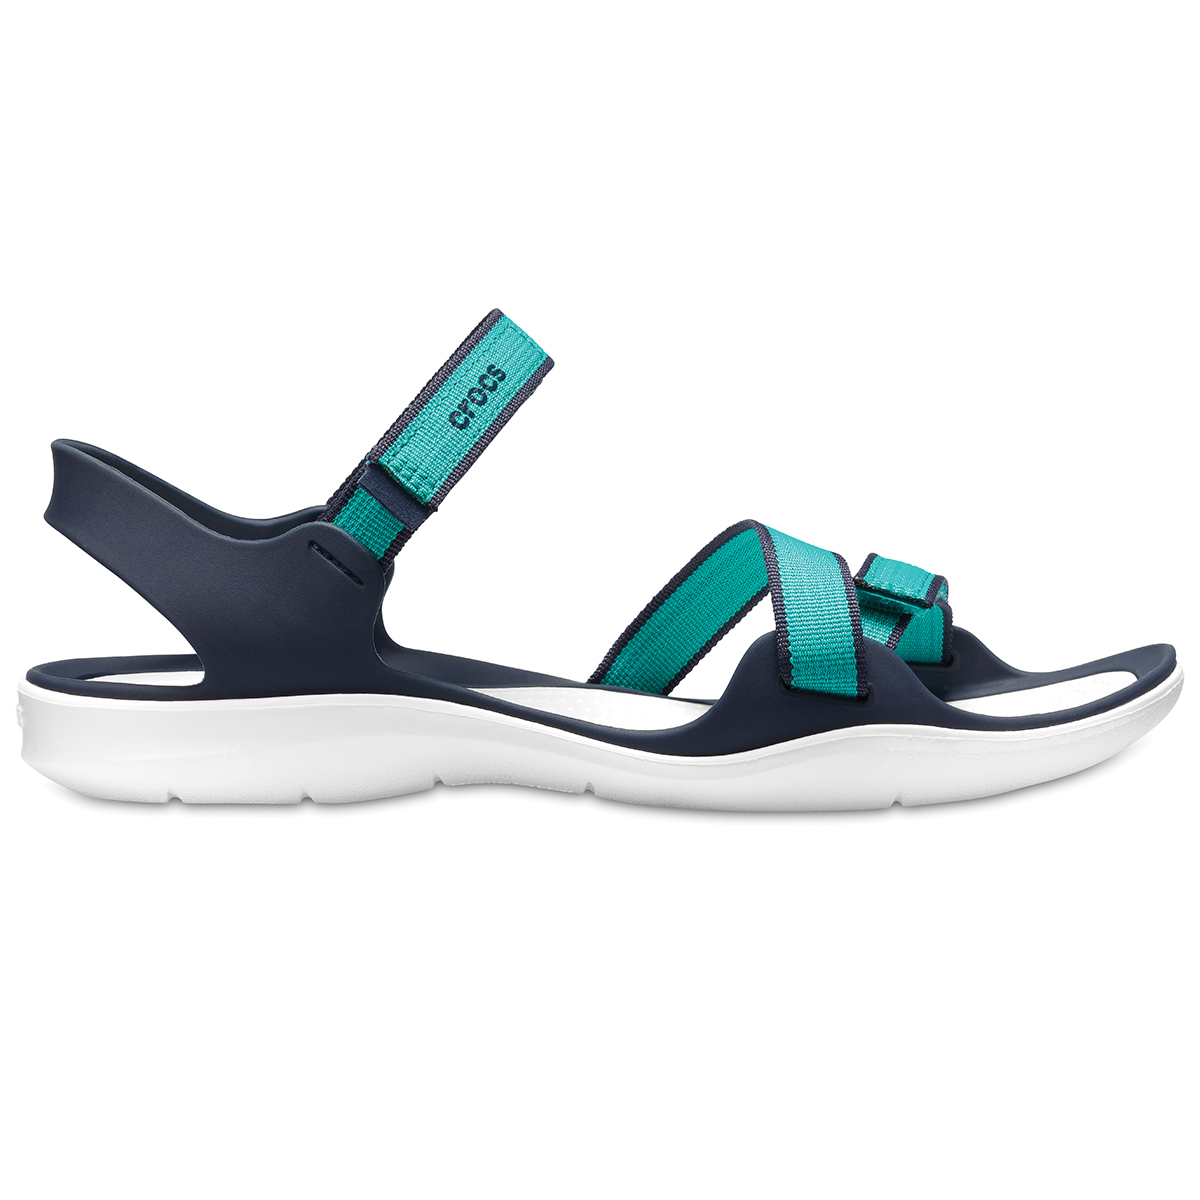 Crocs Swiftwater Webbing Sandal W - Tropikal Deniz mavisi